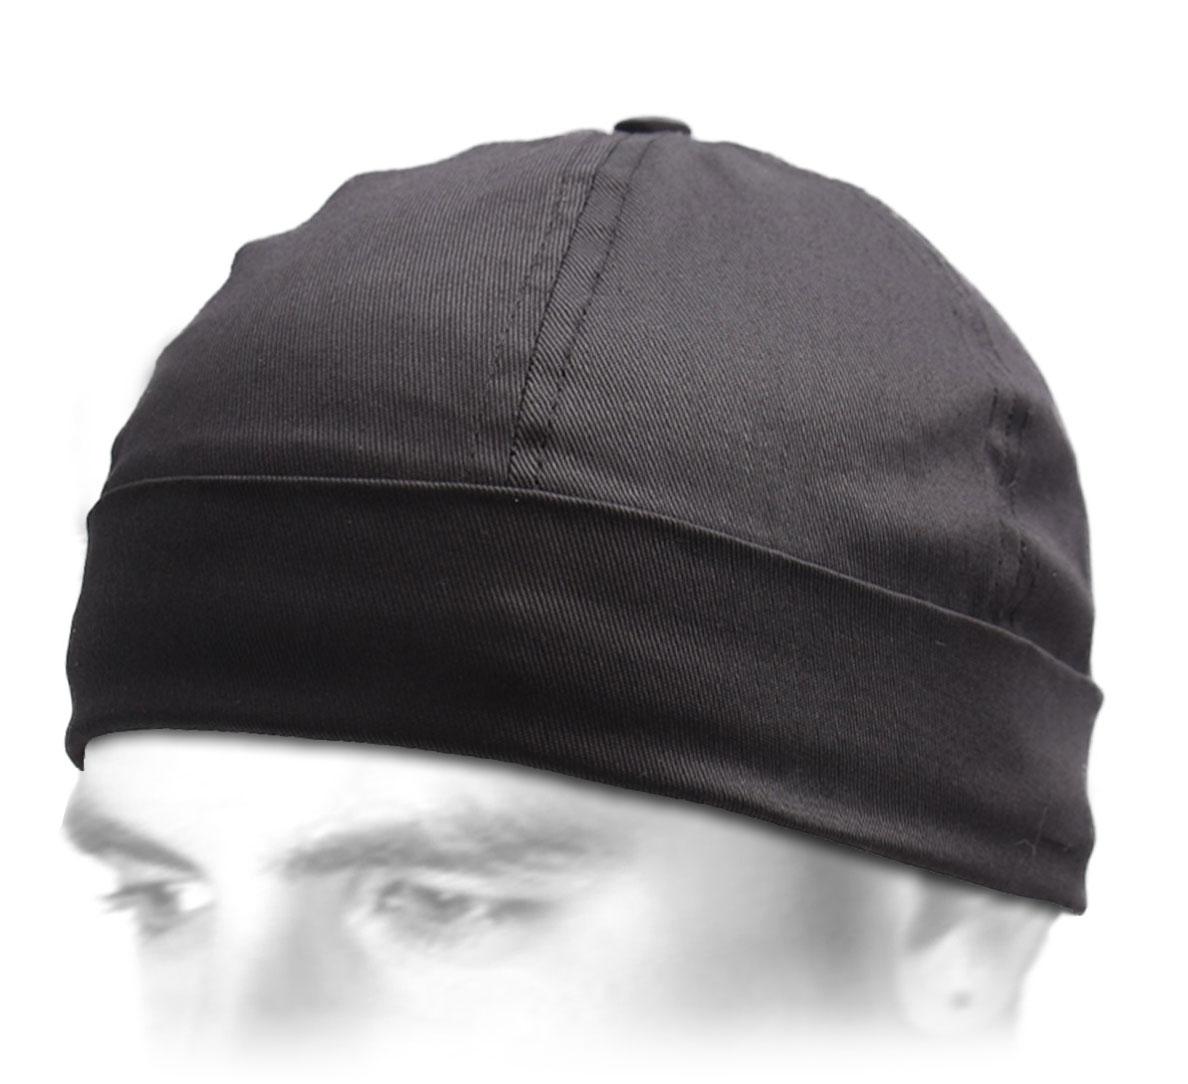 docker coton bonnet marin bord relev s docker coton bonnet. Black Bedroom Furniture Sets. Home Design Ideas